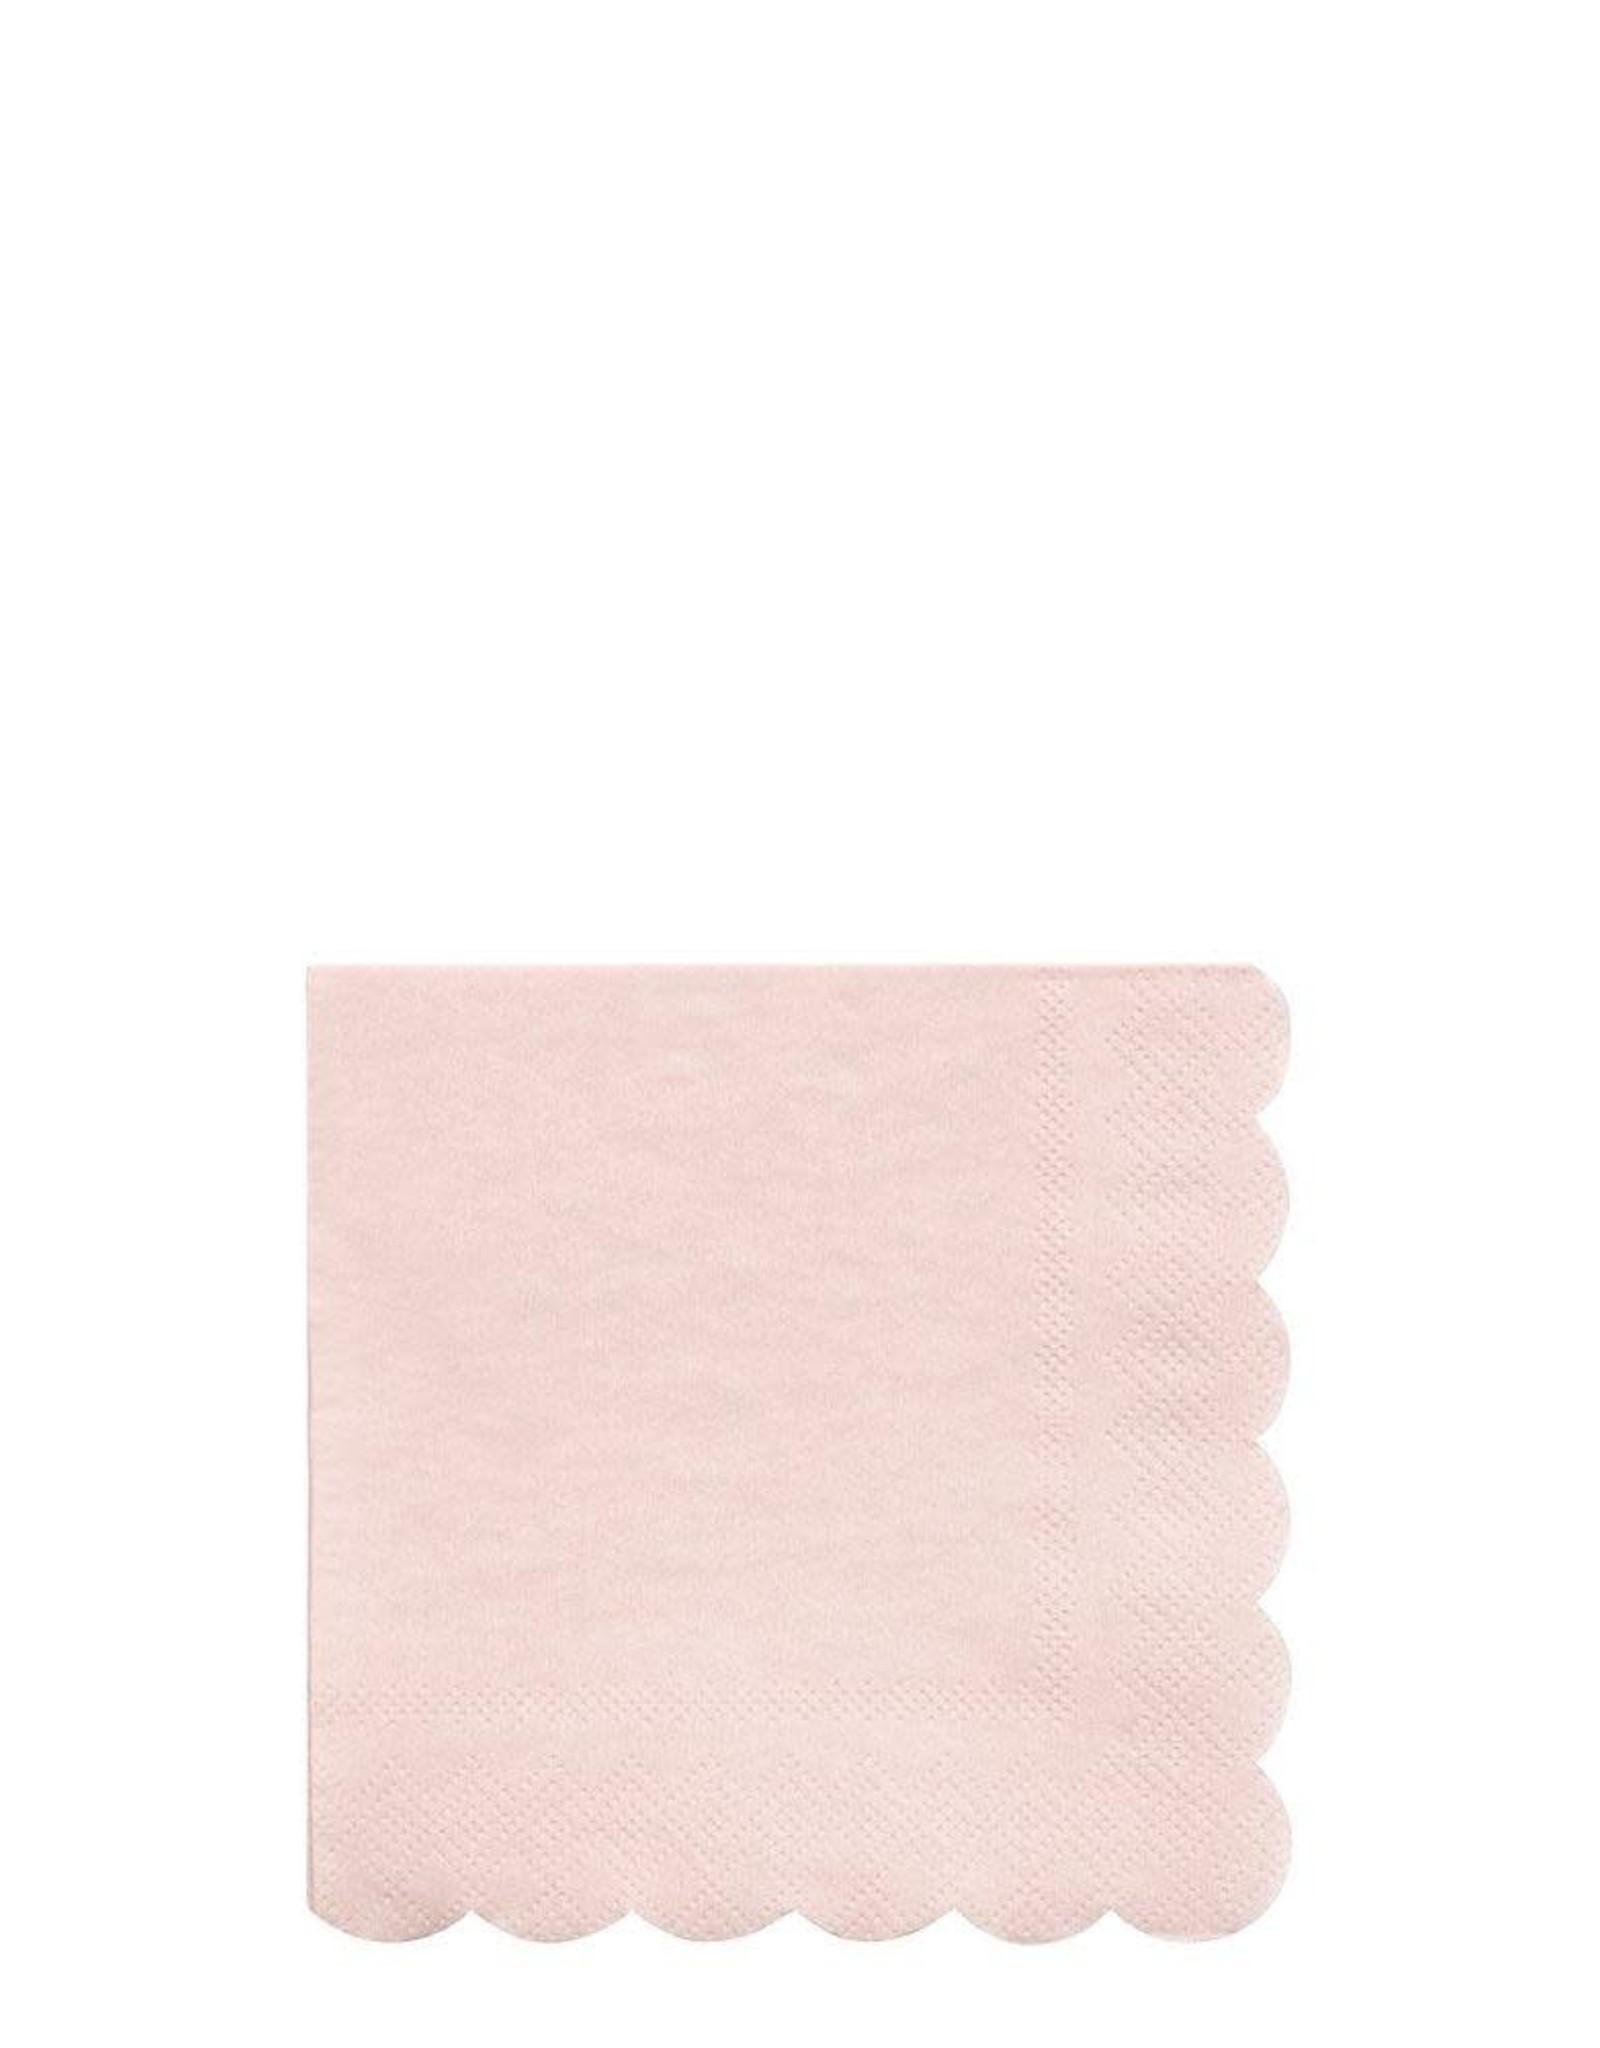 Meri Meri dusty pink napkins